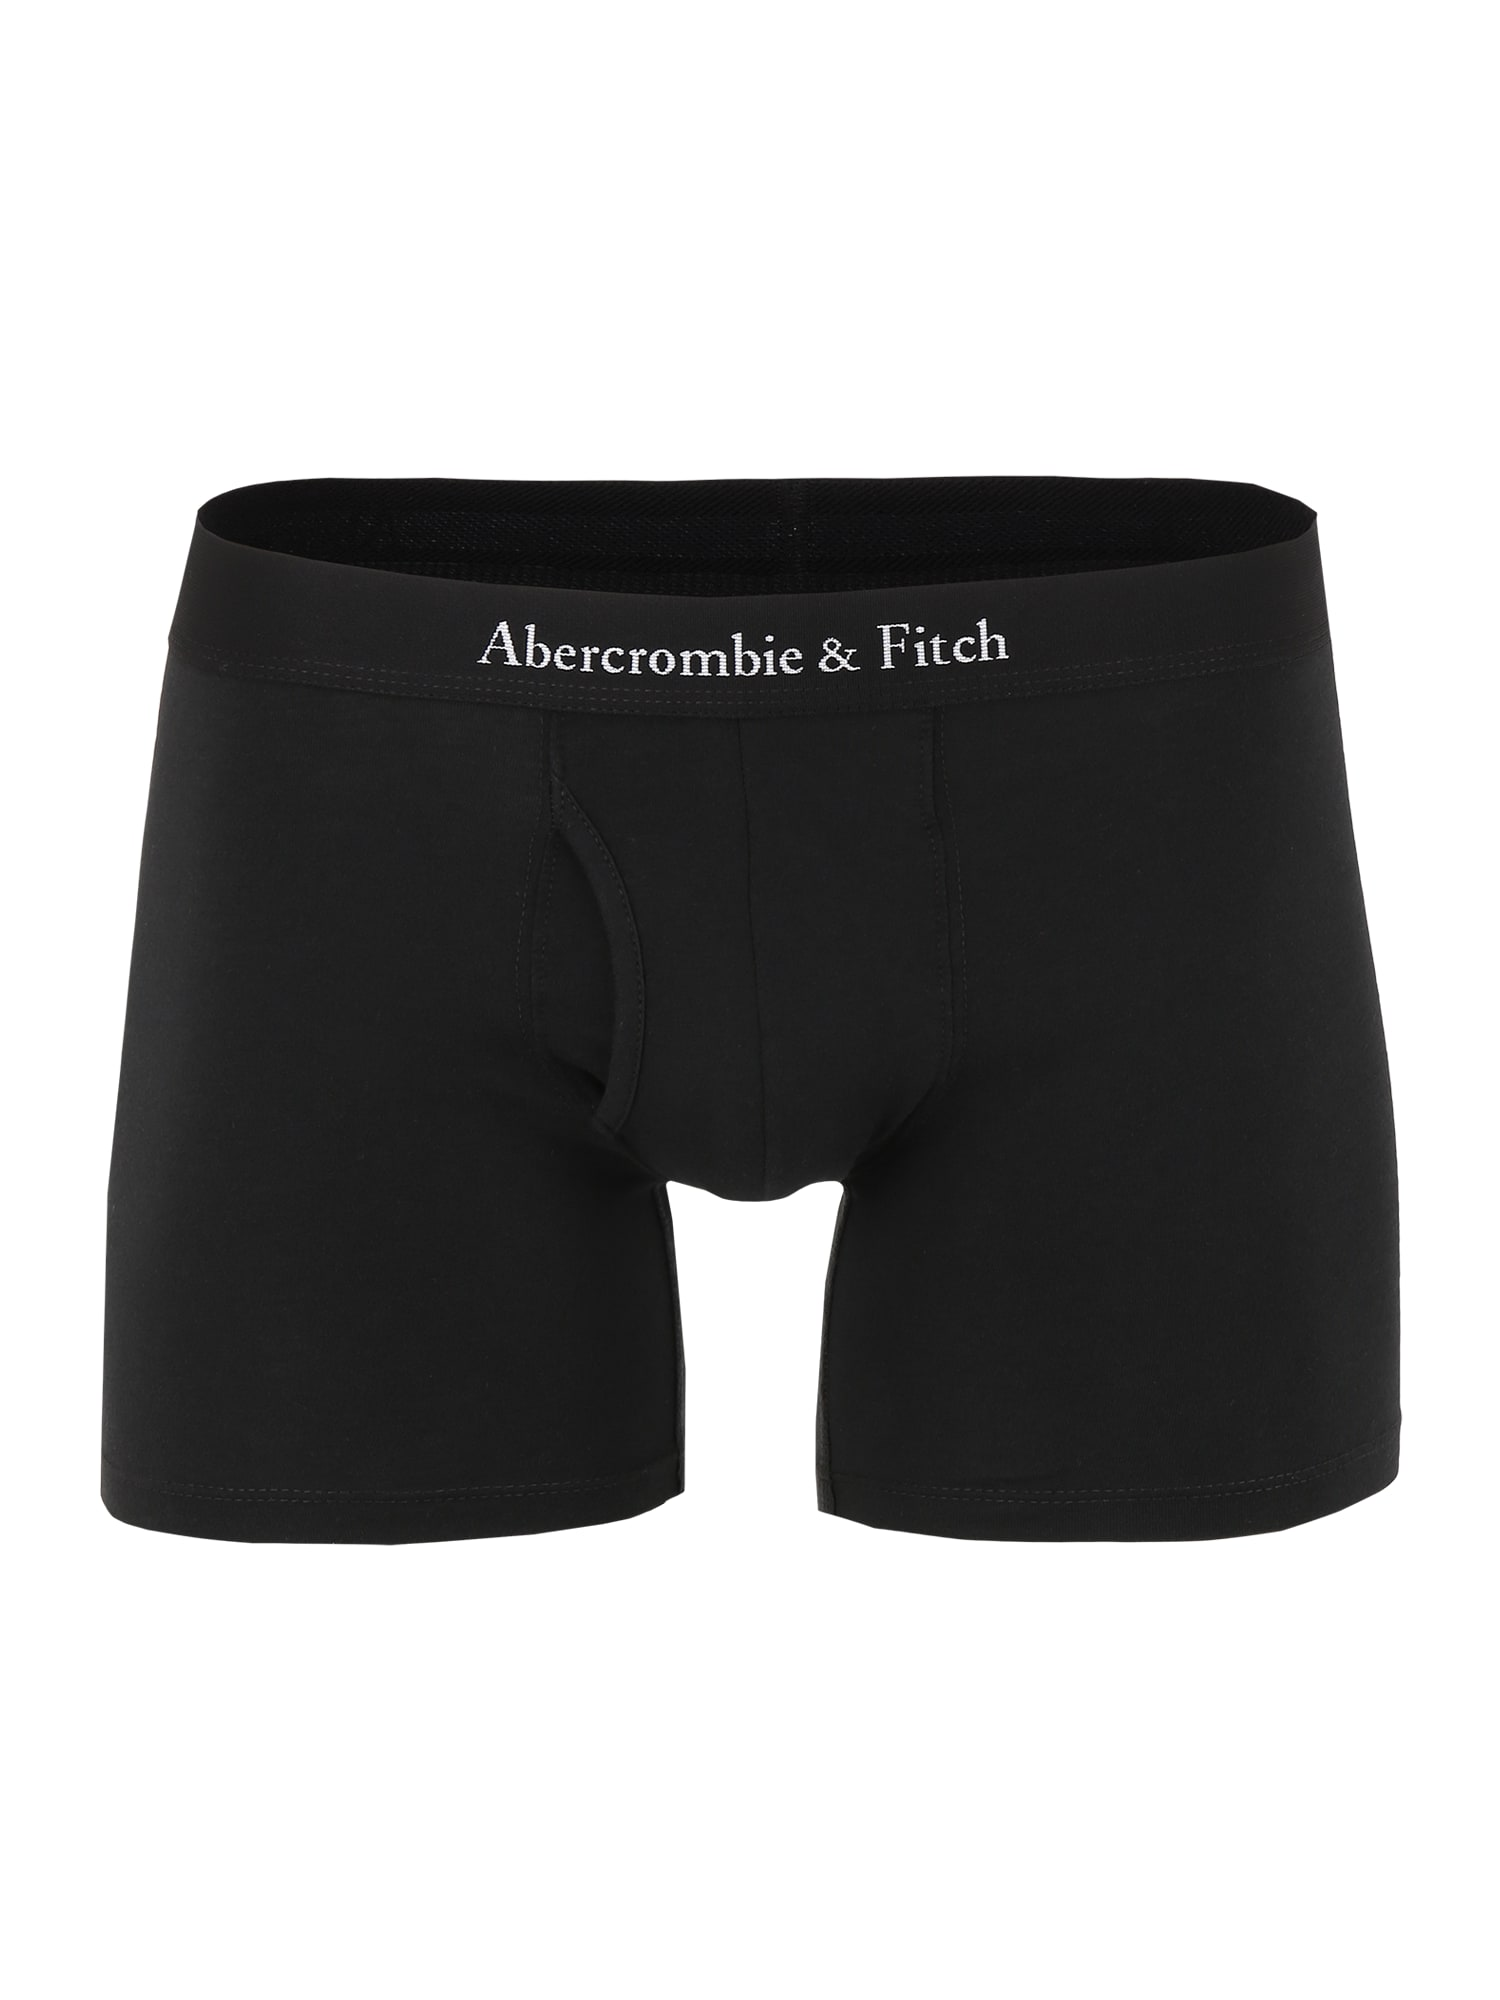 Abercrombie & Fitch Boxer trumpikės juoda / balta